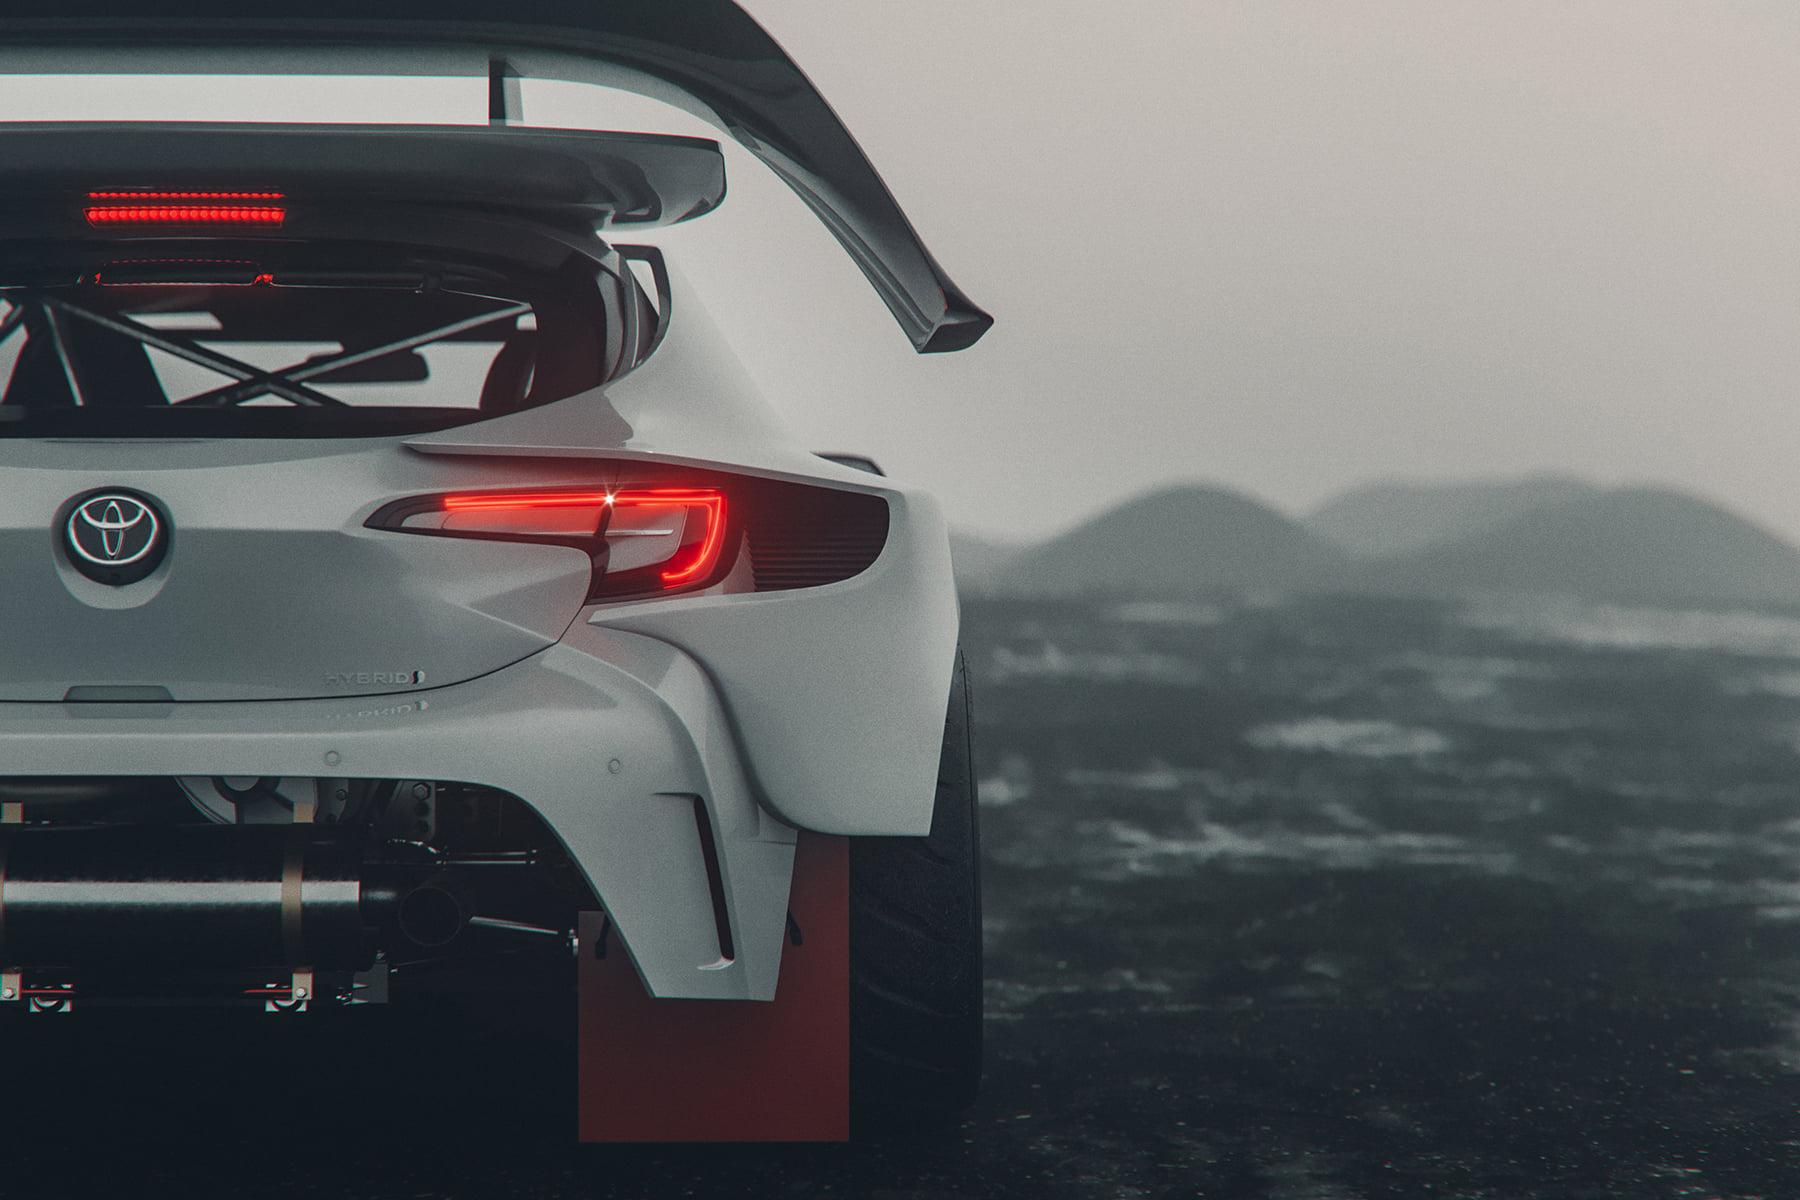 Toyota-GR-Corolla-Group-B-rally-car-5